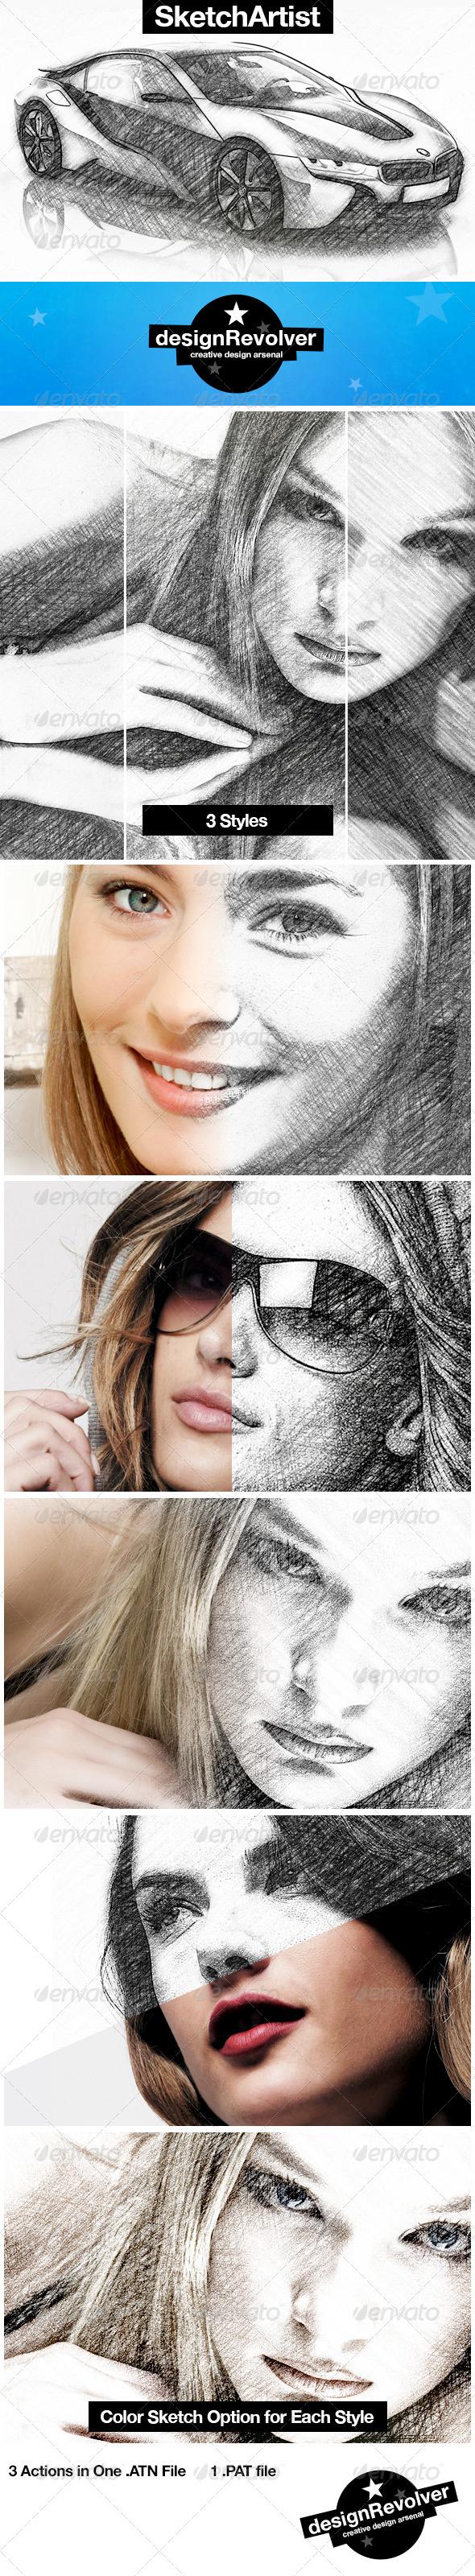 GraphicRiver Sketch Artist Photoshop Action 5448005